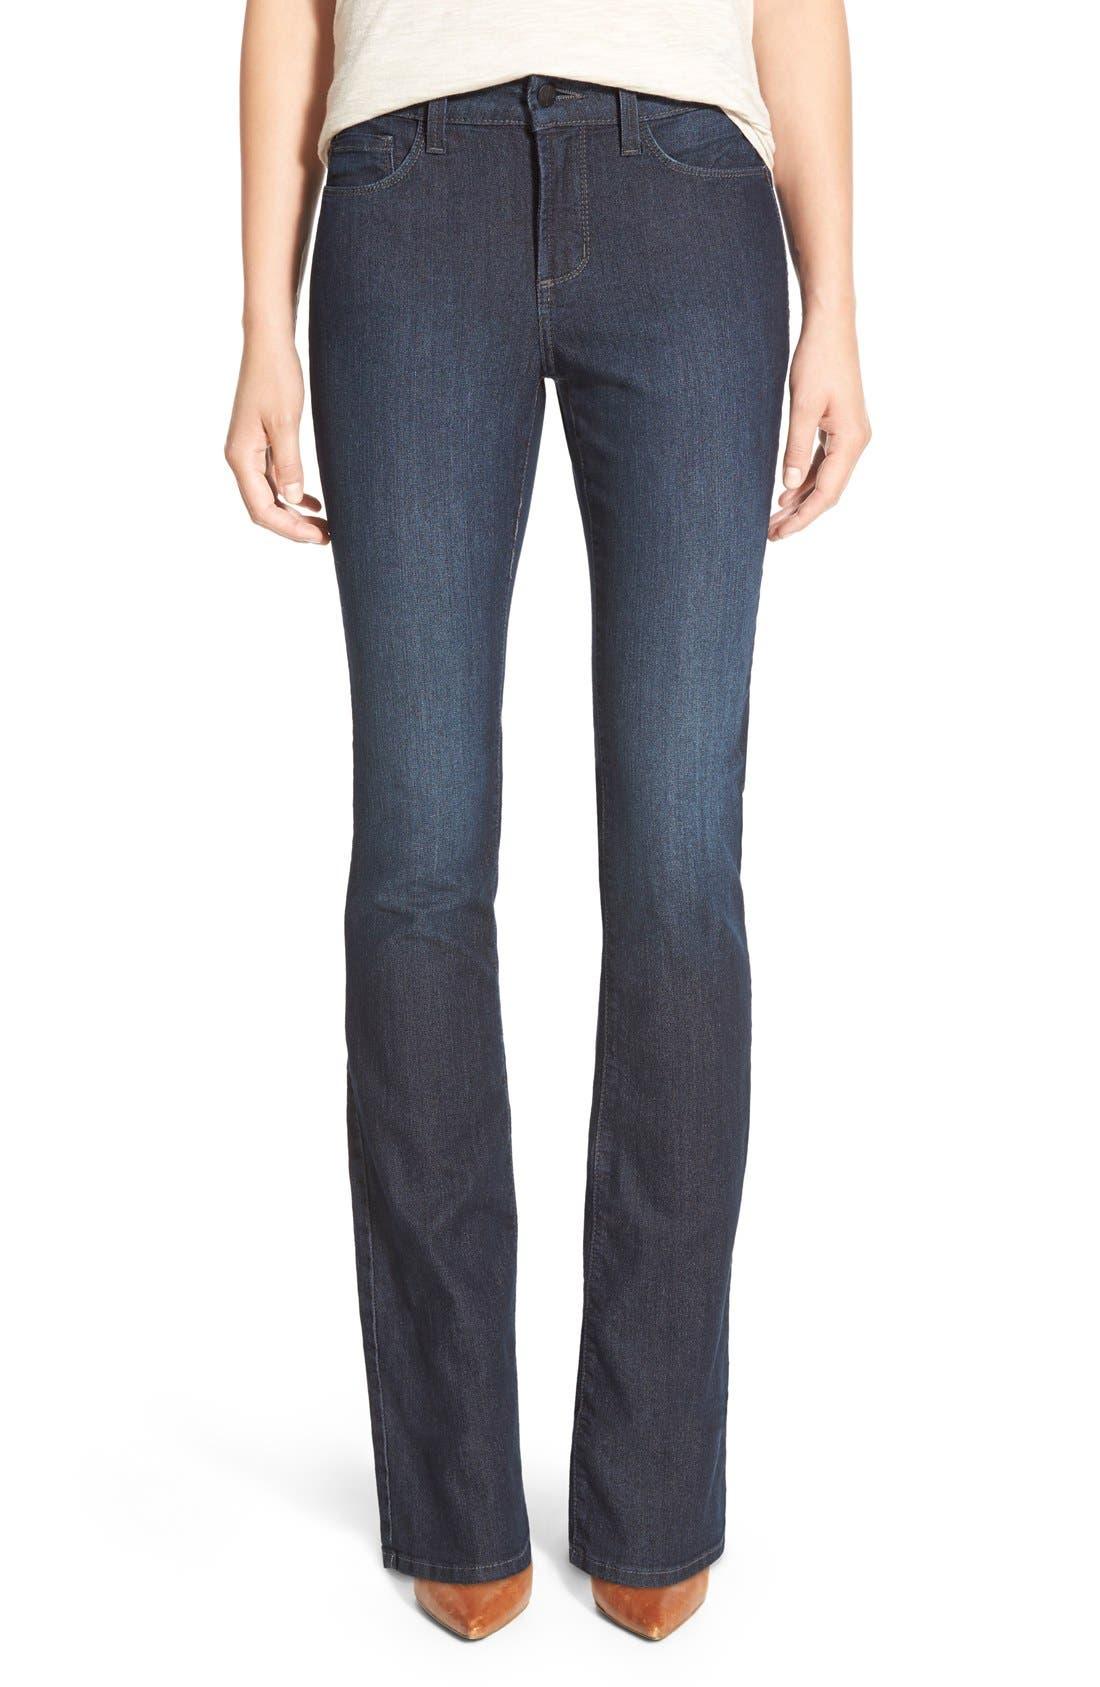 'Billie' Stretch Mini Bootcut Jeans,                         Main,                         color,